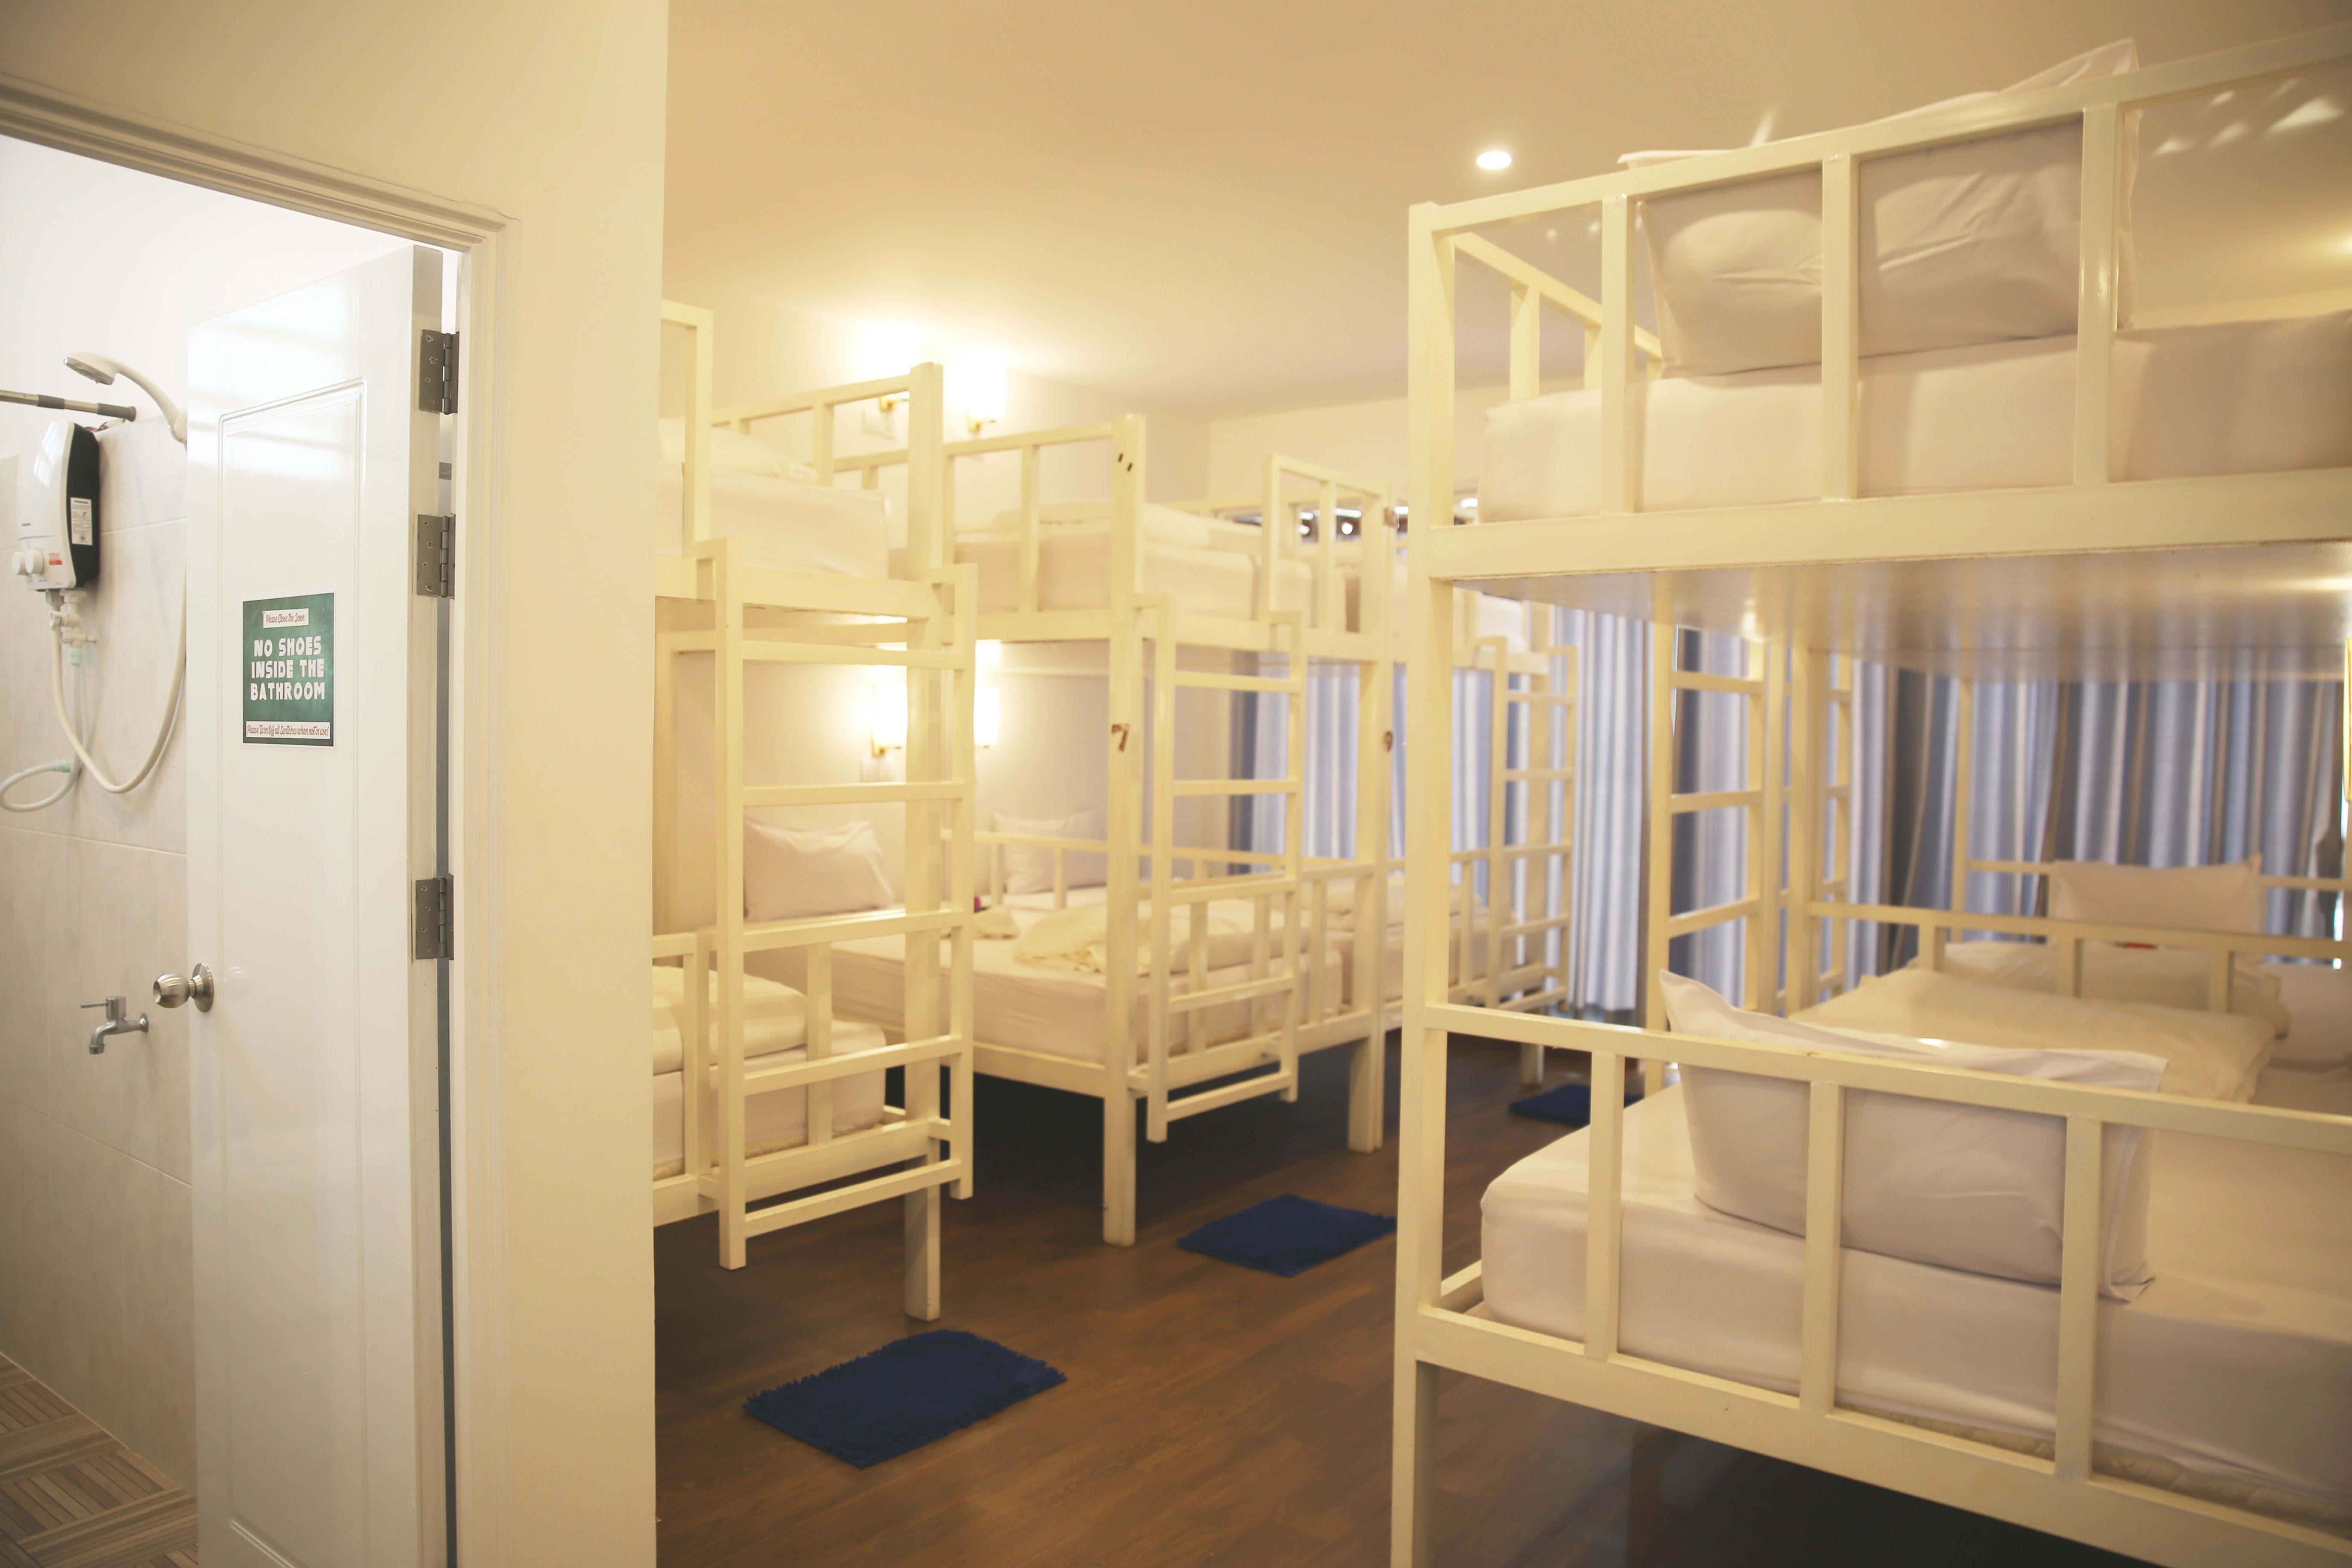 HOSTEL - Damnak Riverside Bunk Bed Hostel & Bar